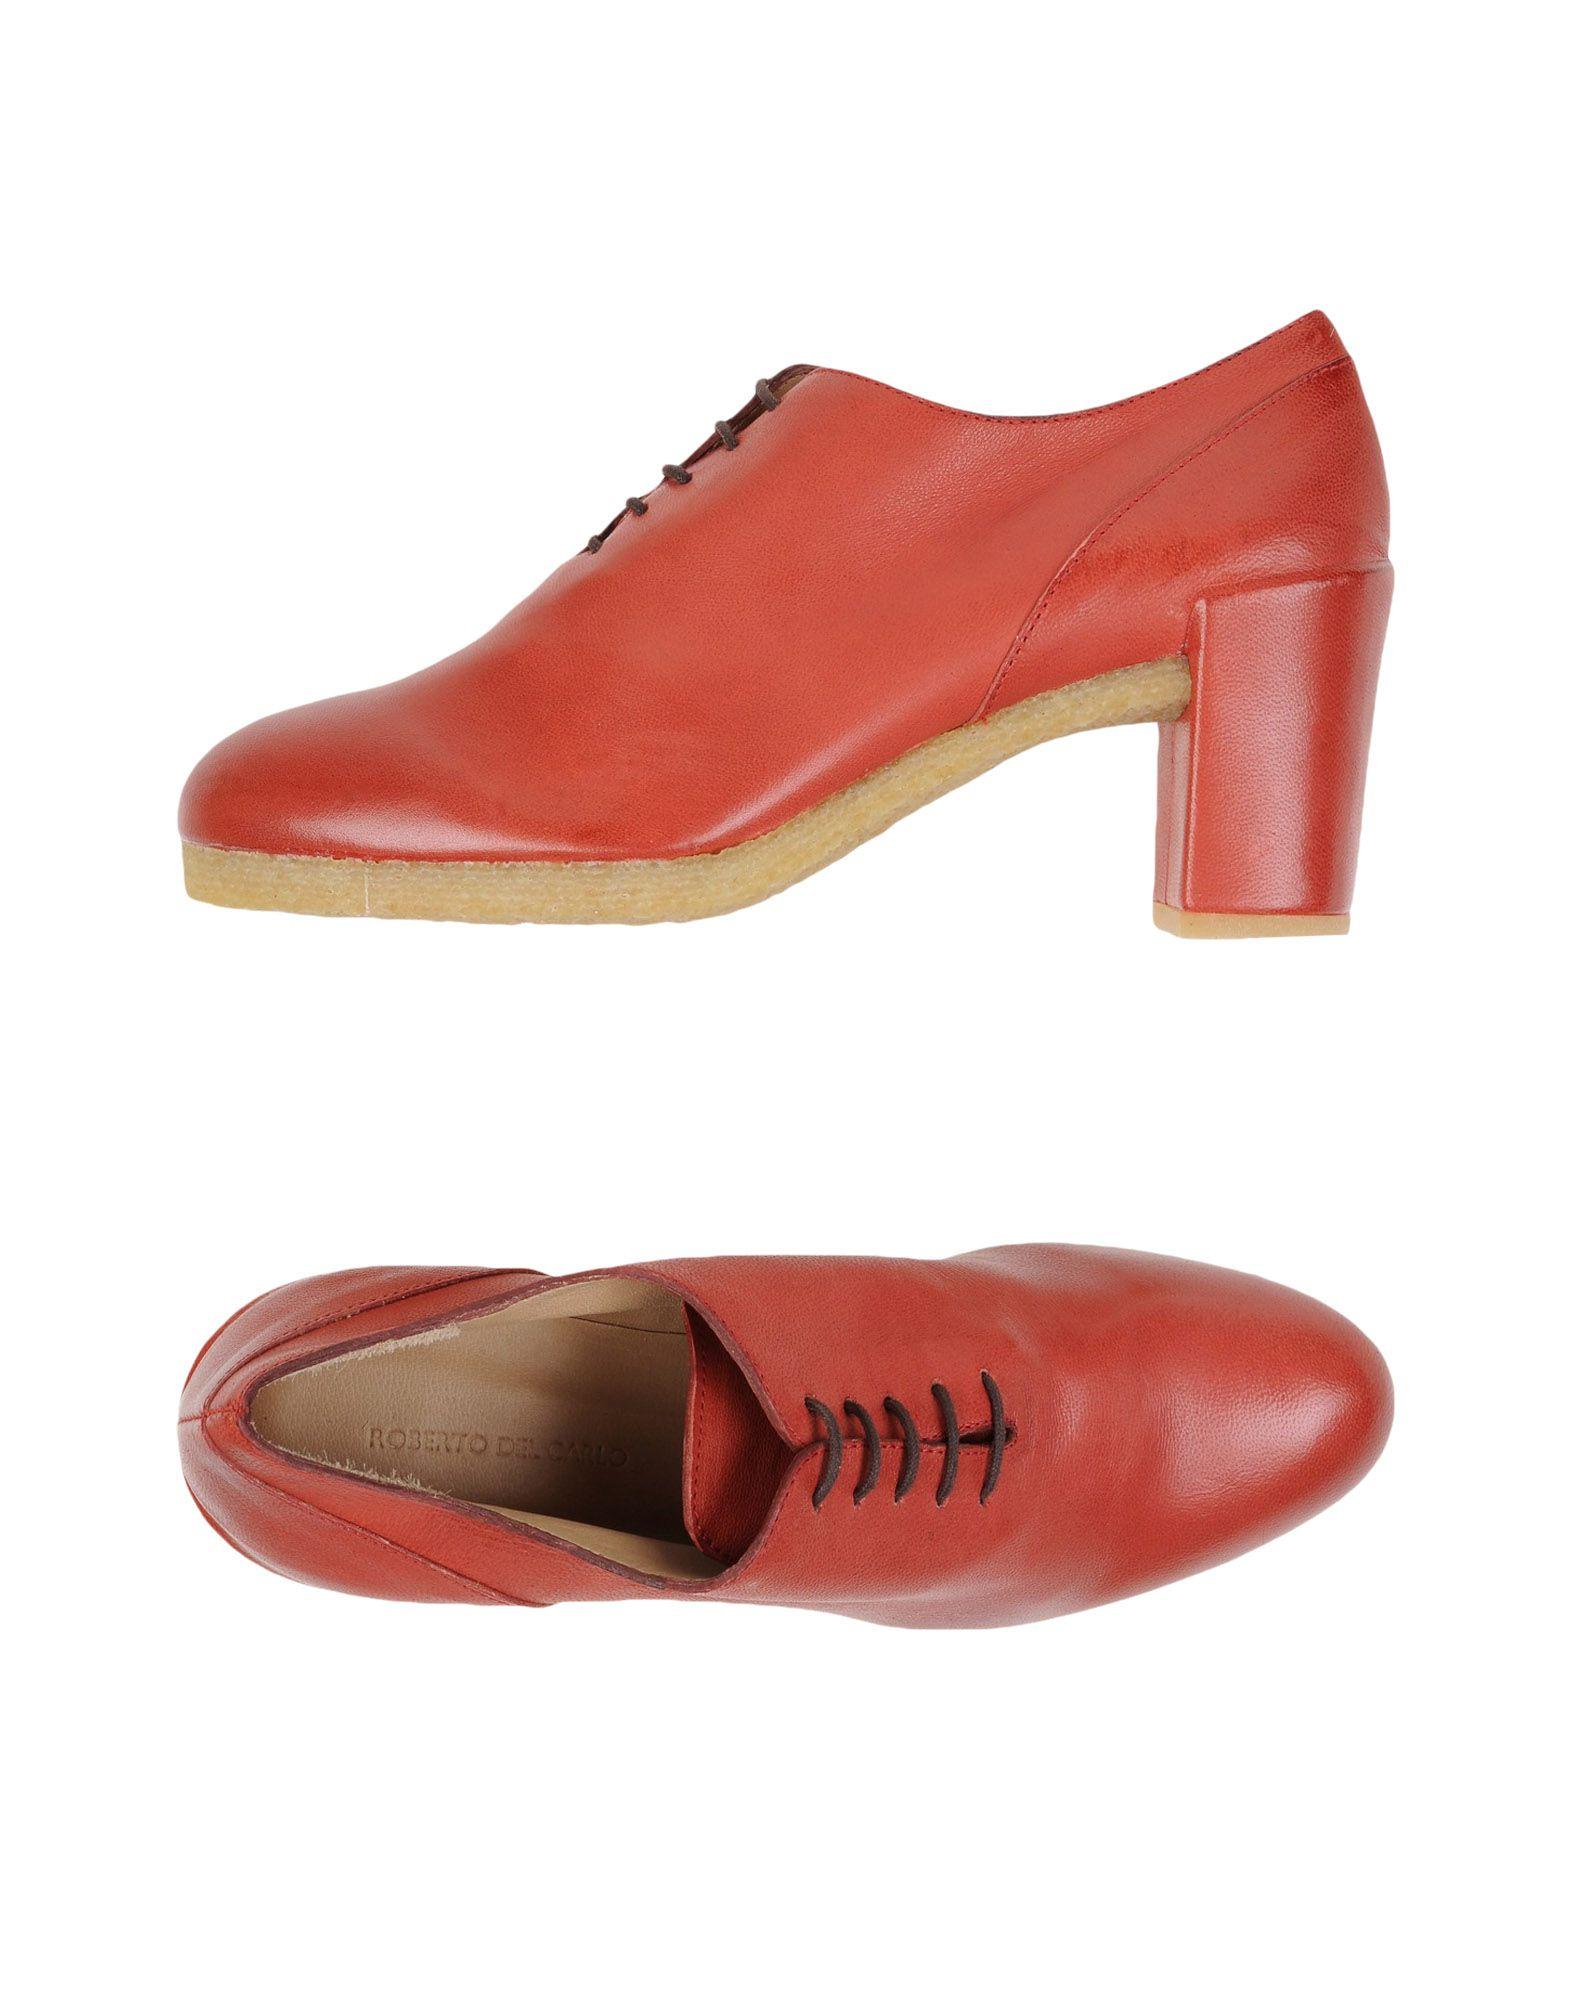 Chaussures À Lacets Roberto Del Carlo Femme - Chaussures À Lacets Roberto Del Carlo sur